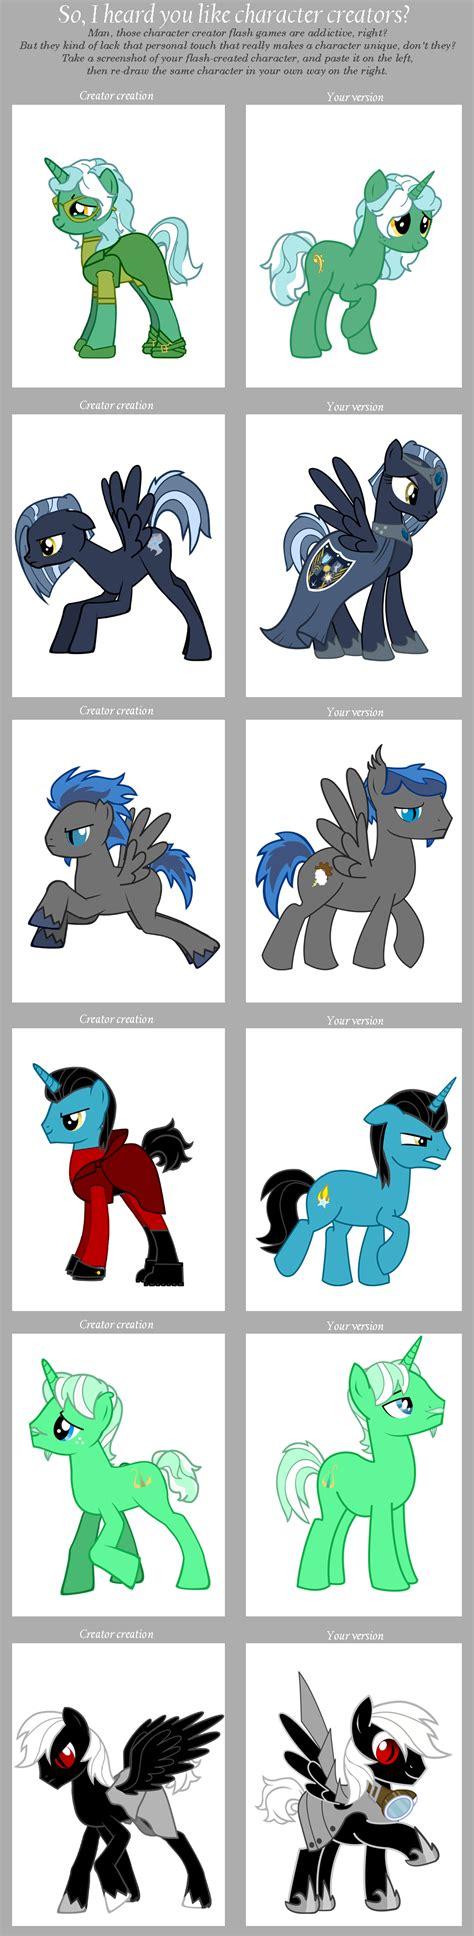 Meme Character Creator - character creator meme by mokrosuhibrijac on deviantart